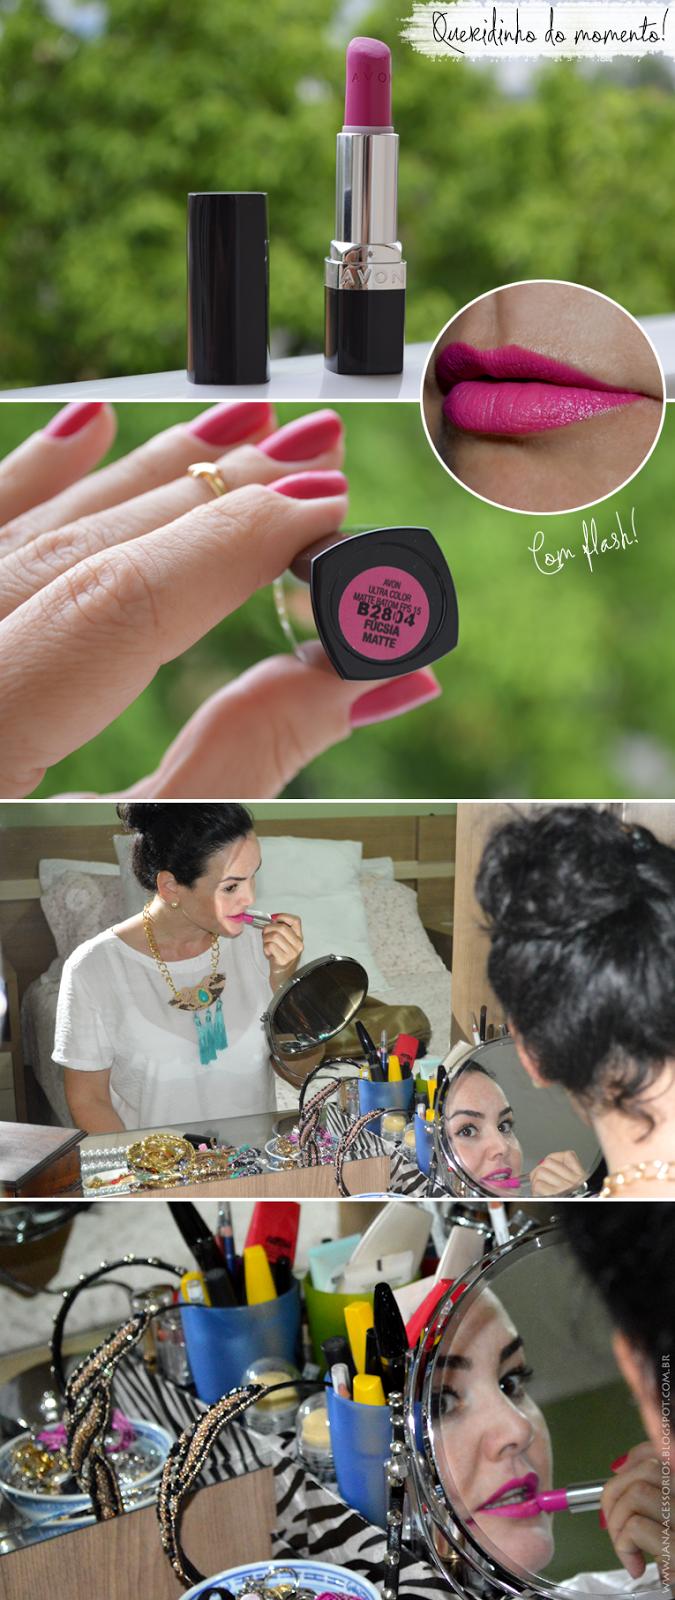 Blog da Jana, blog de acessórios, avon, joinville, jana, blogueira, moda, make,